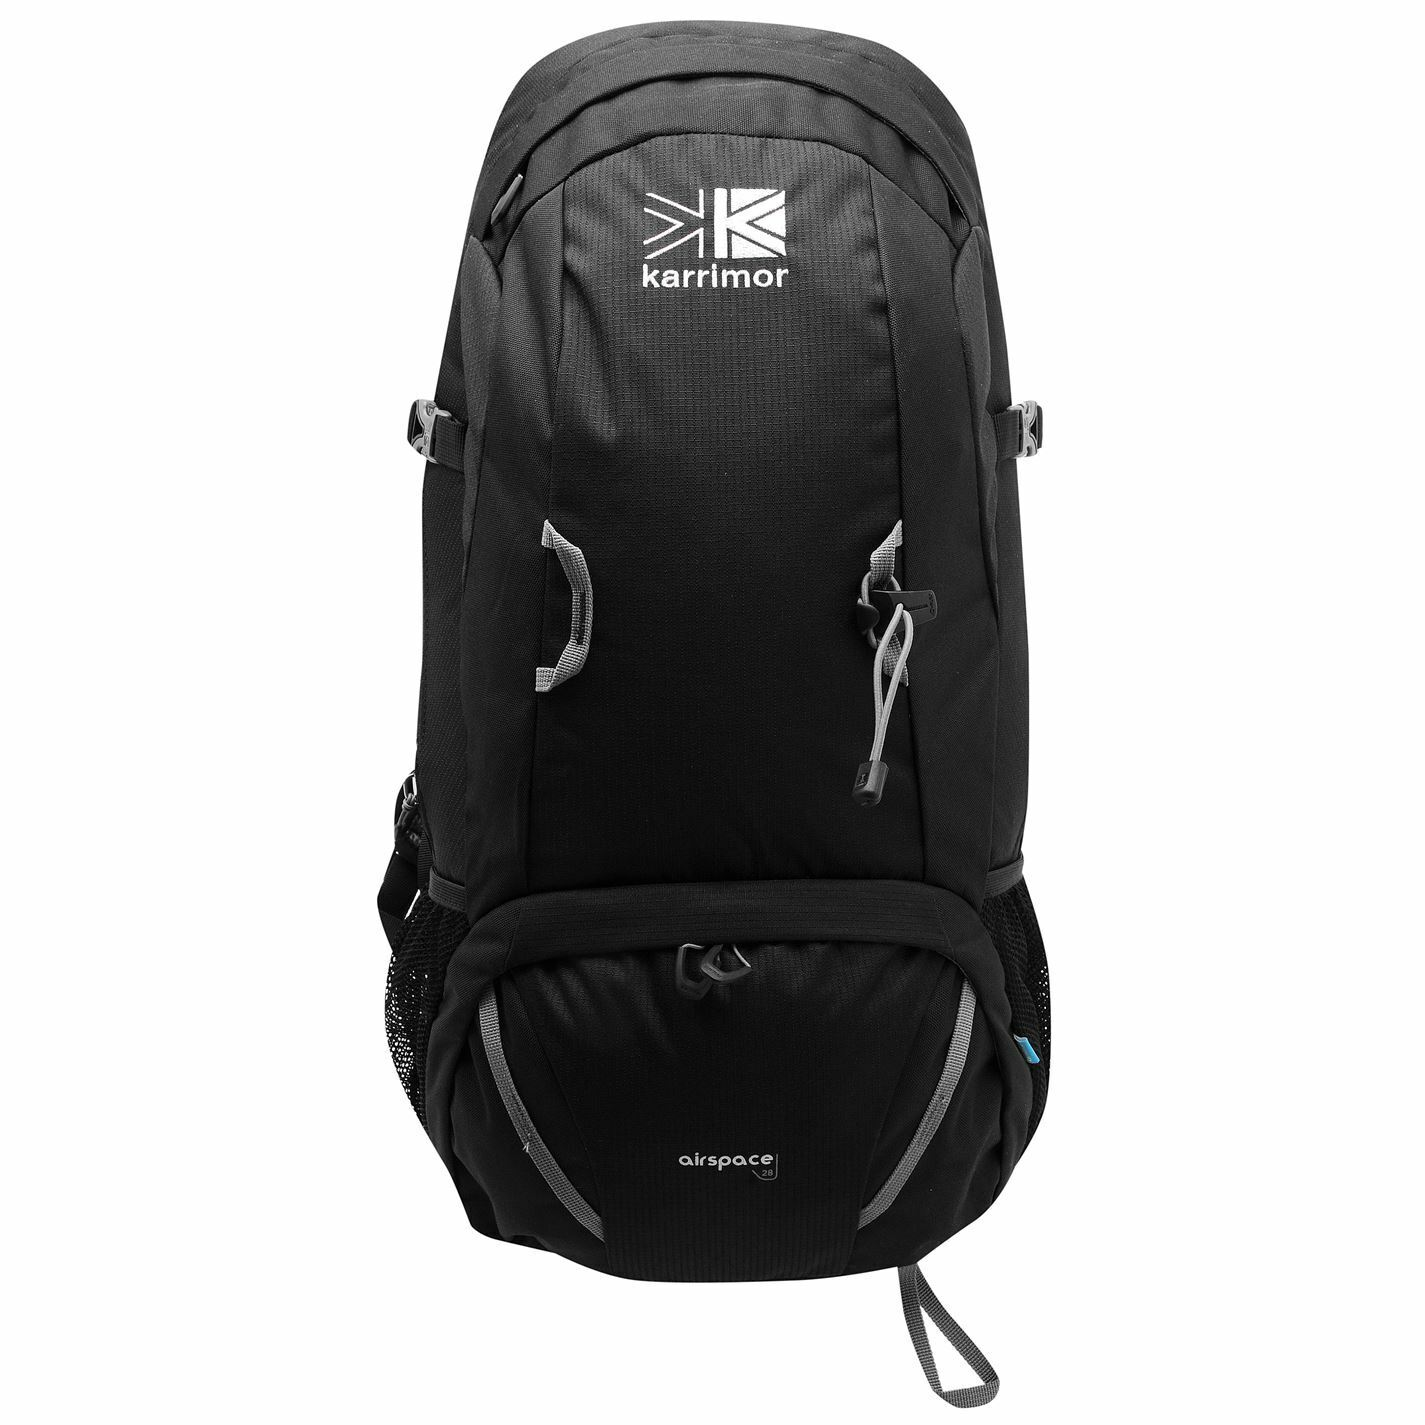 New OGIO Travel Luggage Bullion 17L Backpack Rucksack Holdall Bag Black